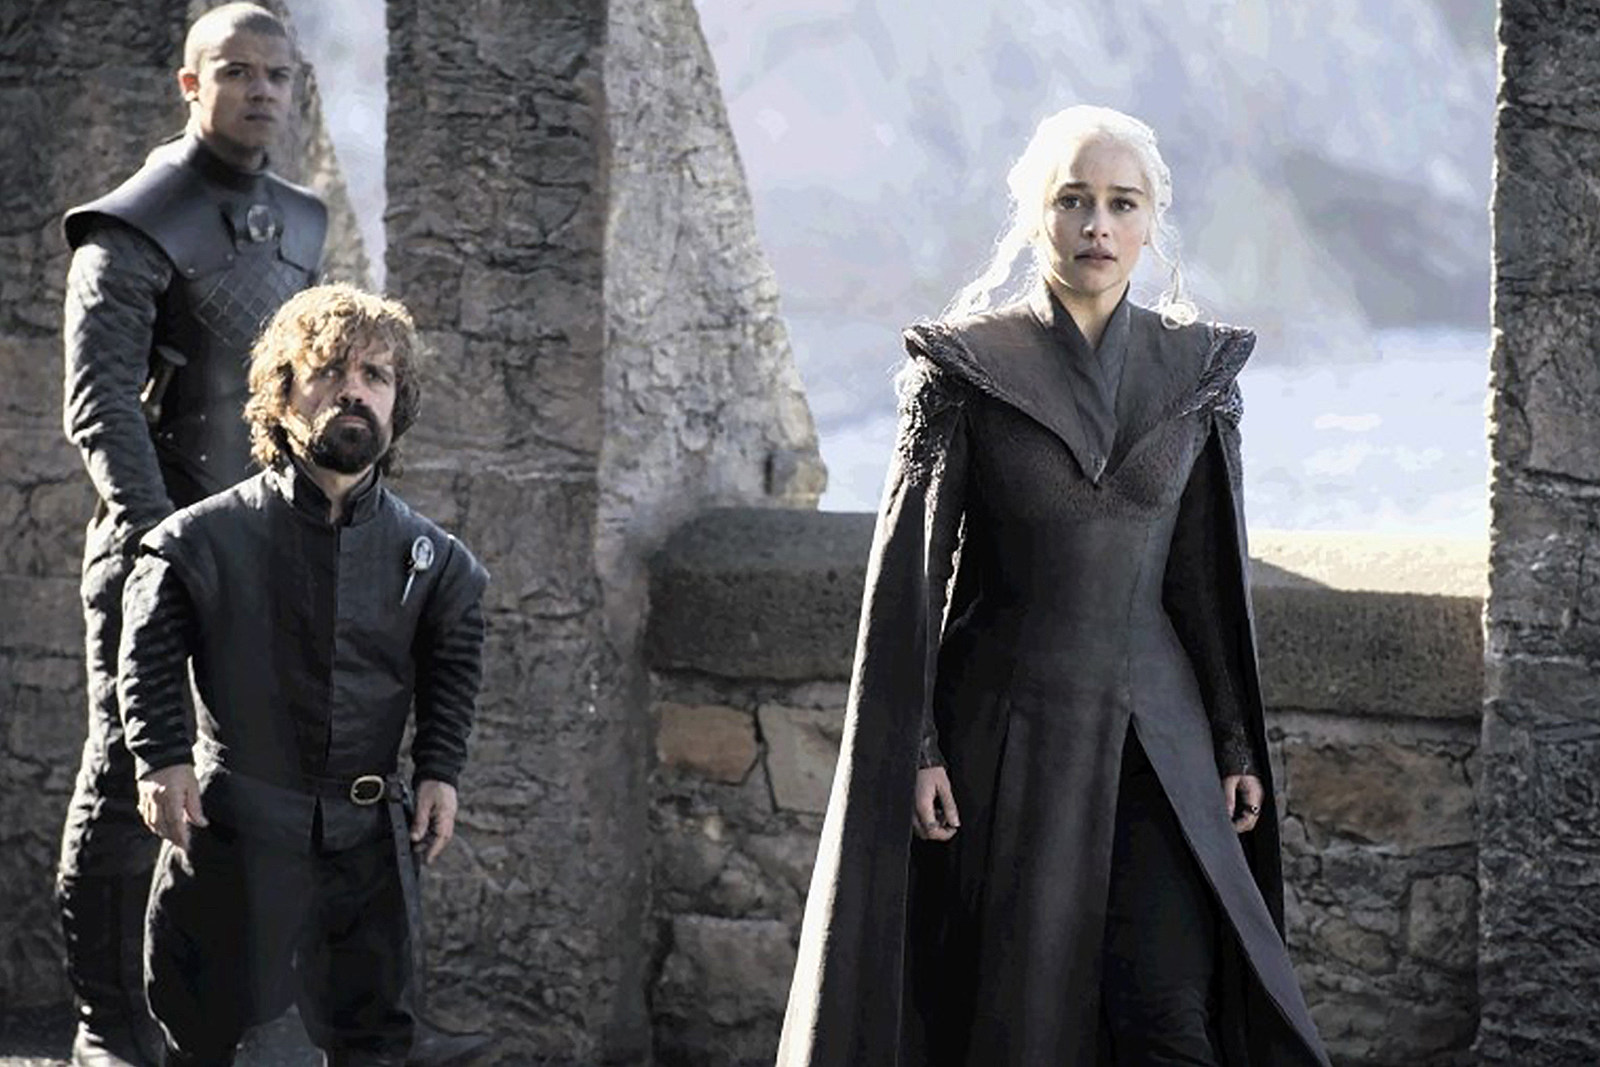 New Game of Thrones Season 7 Photos